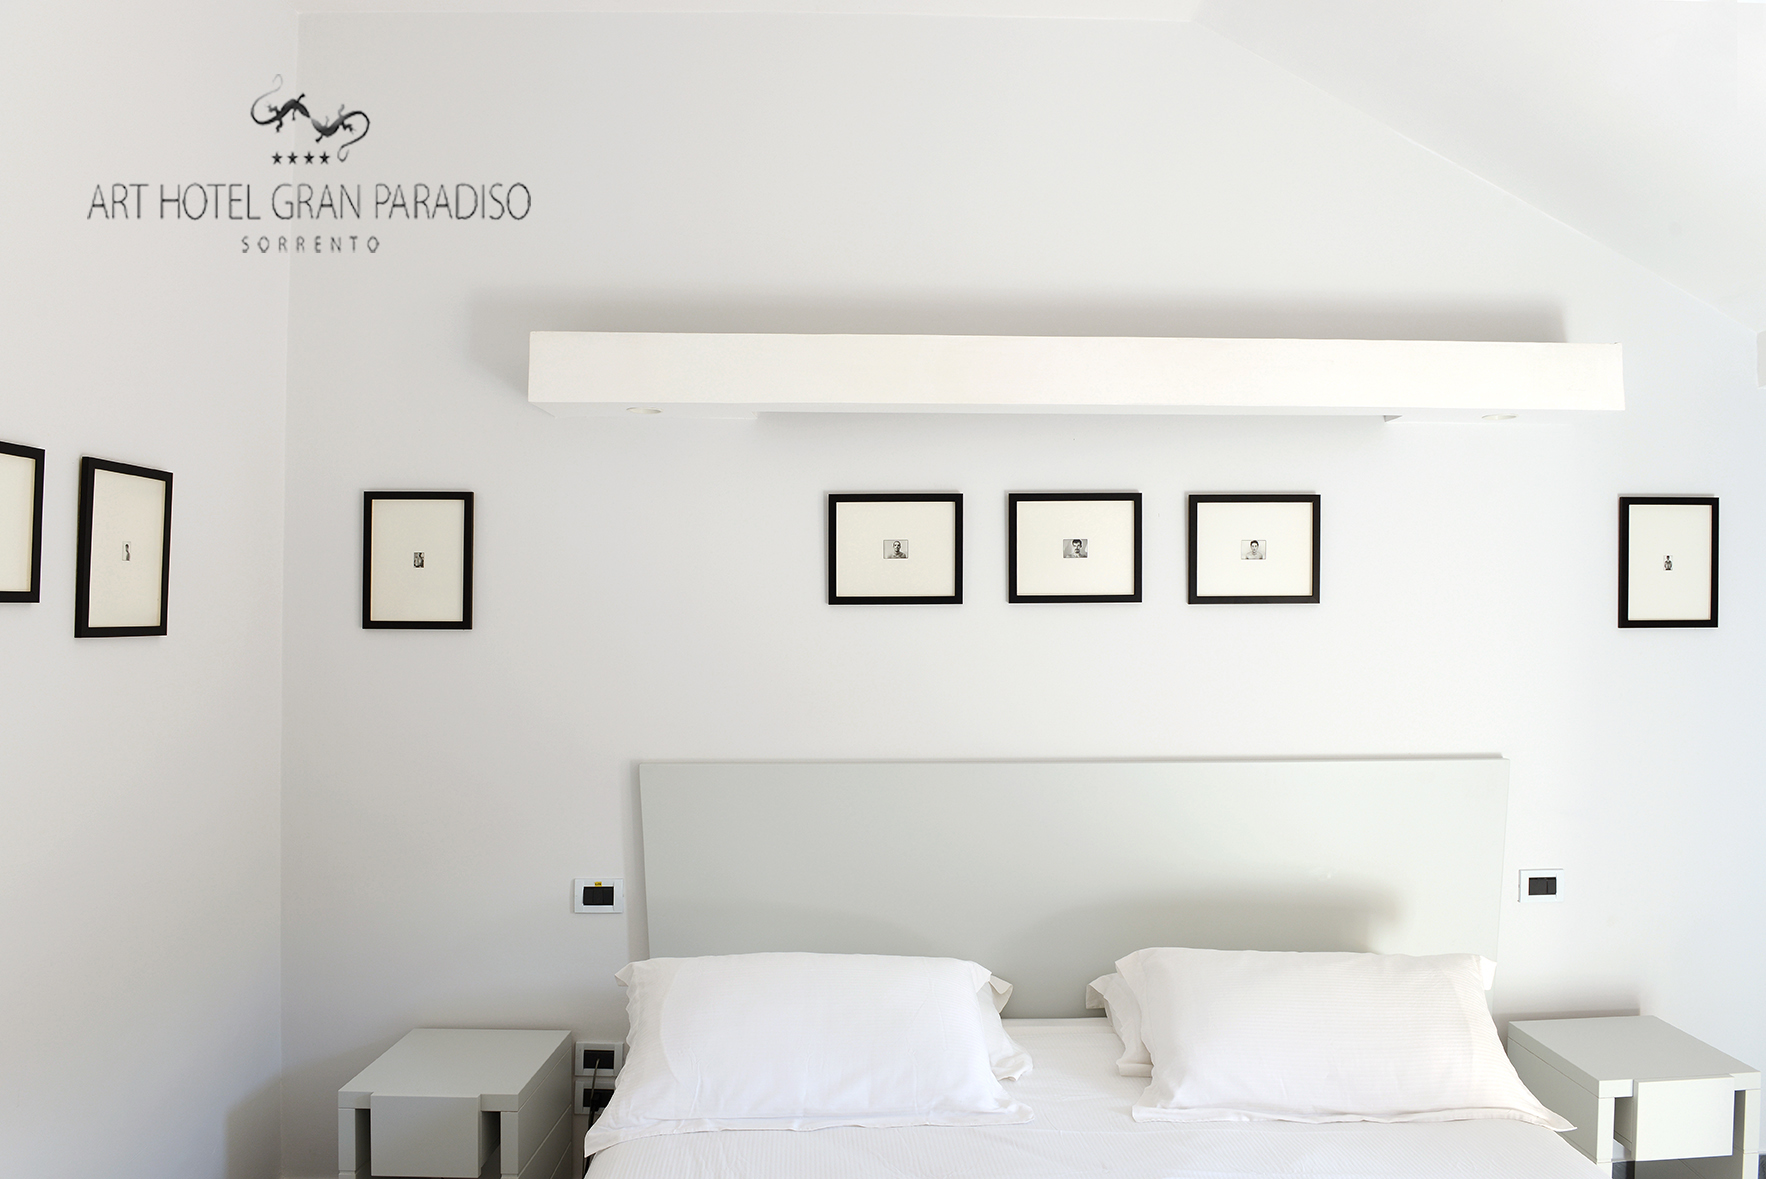 Art_Hotel_Gran_Paradiso_2013_412_Luca_Massimo_Barbero_1.jpg